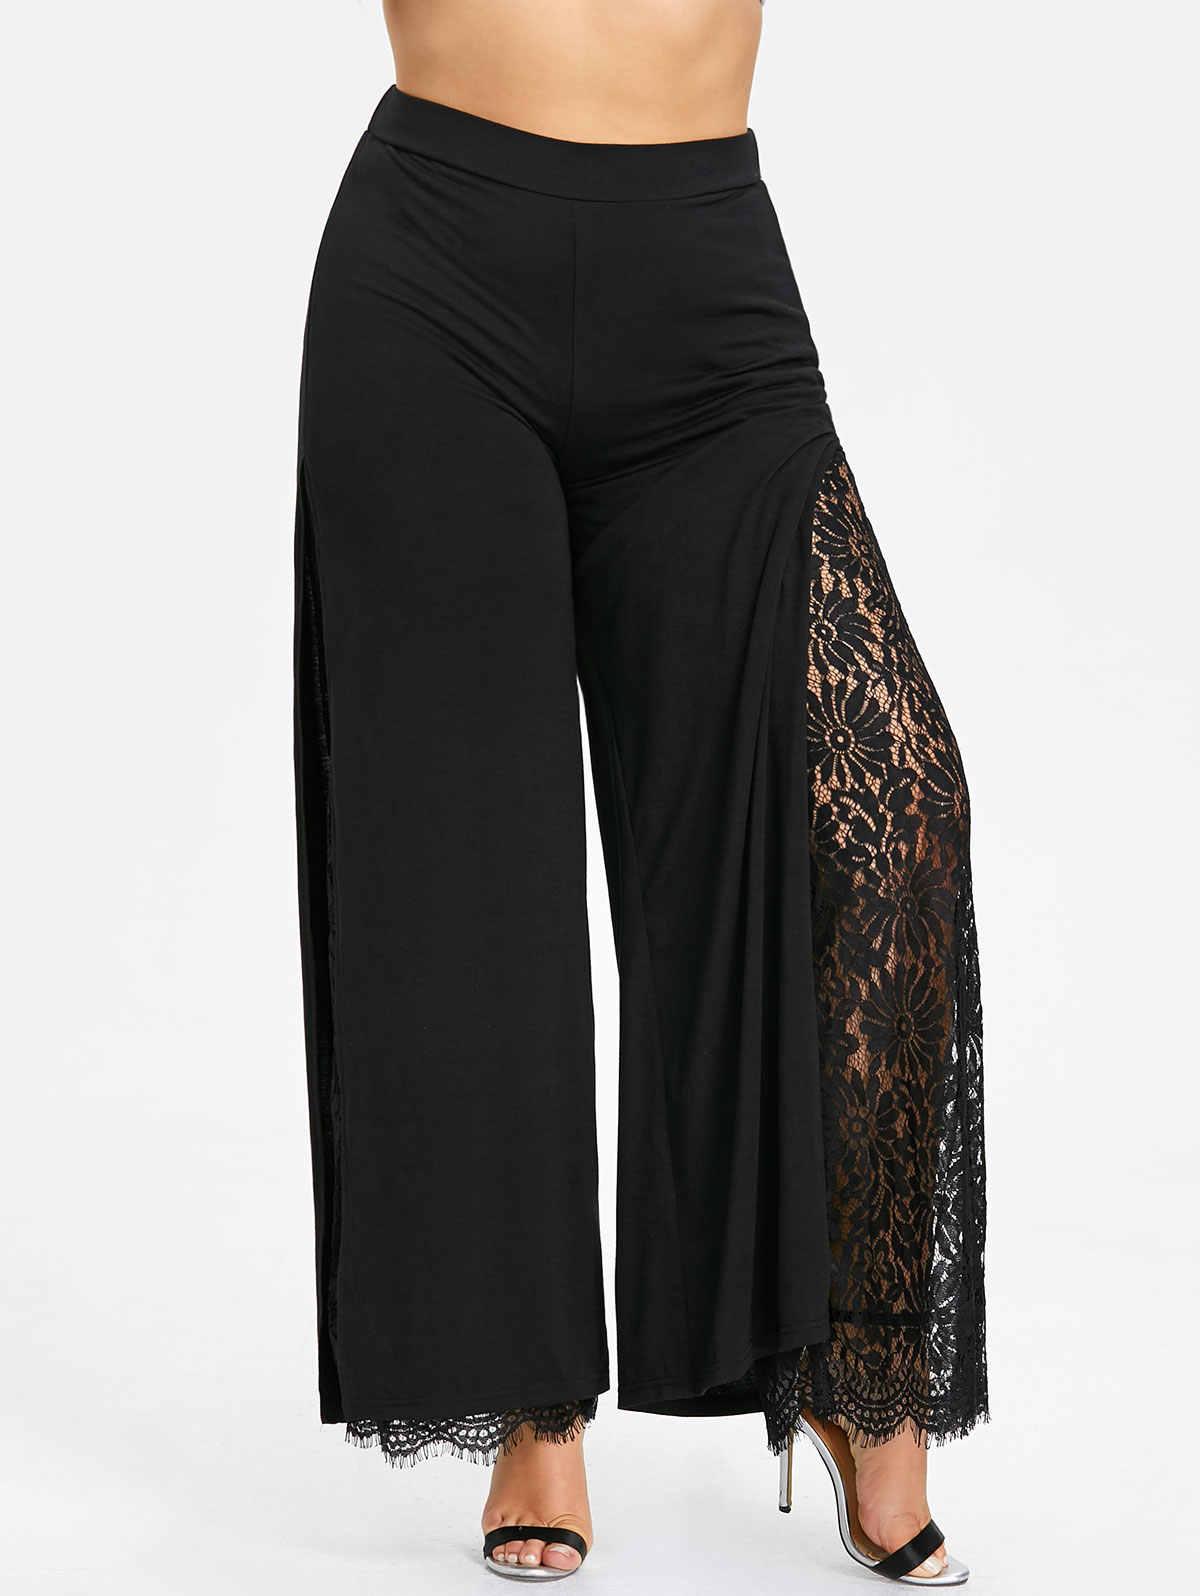 f28b1ffcbde7 Wipalo Plus Size Women Summer Wide Leg Pants Casual Loose High Slit Lace Palazzo  Pants Women